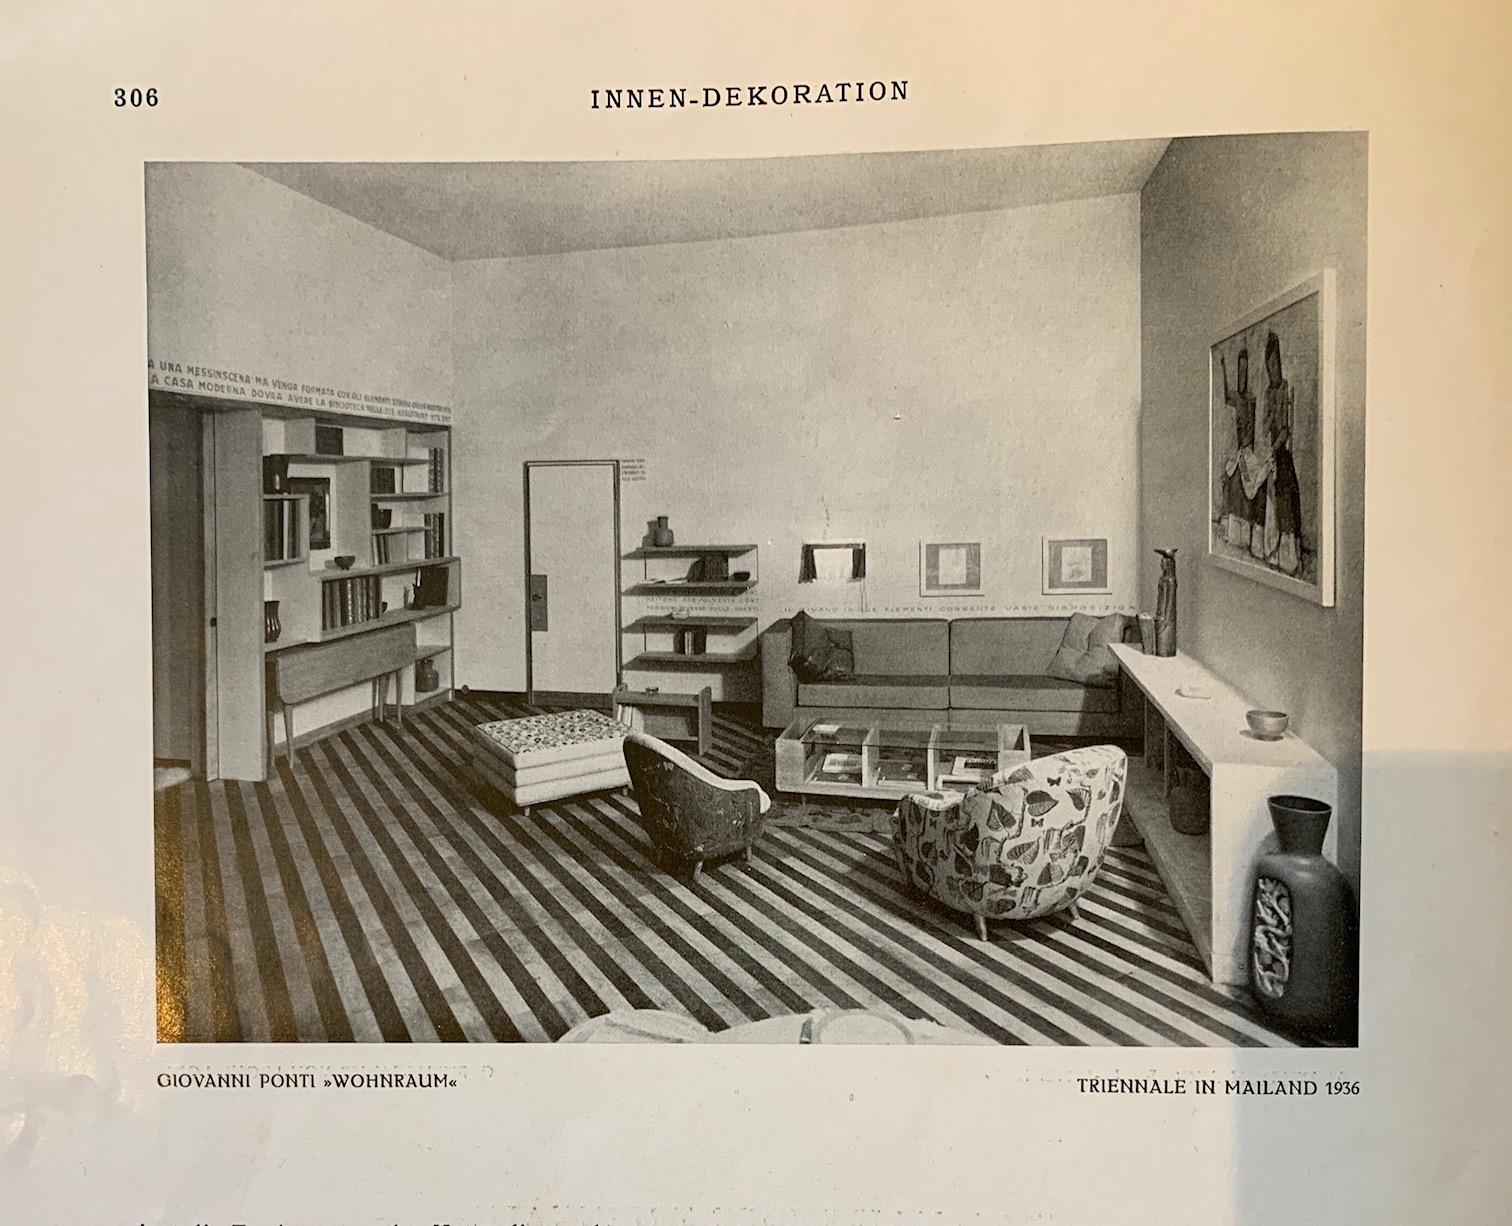 Innen_Dekoration_1936.jpg